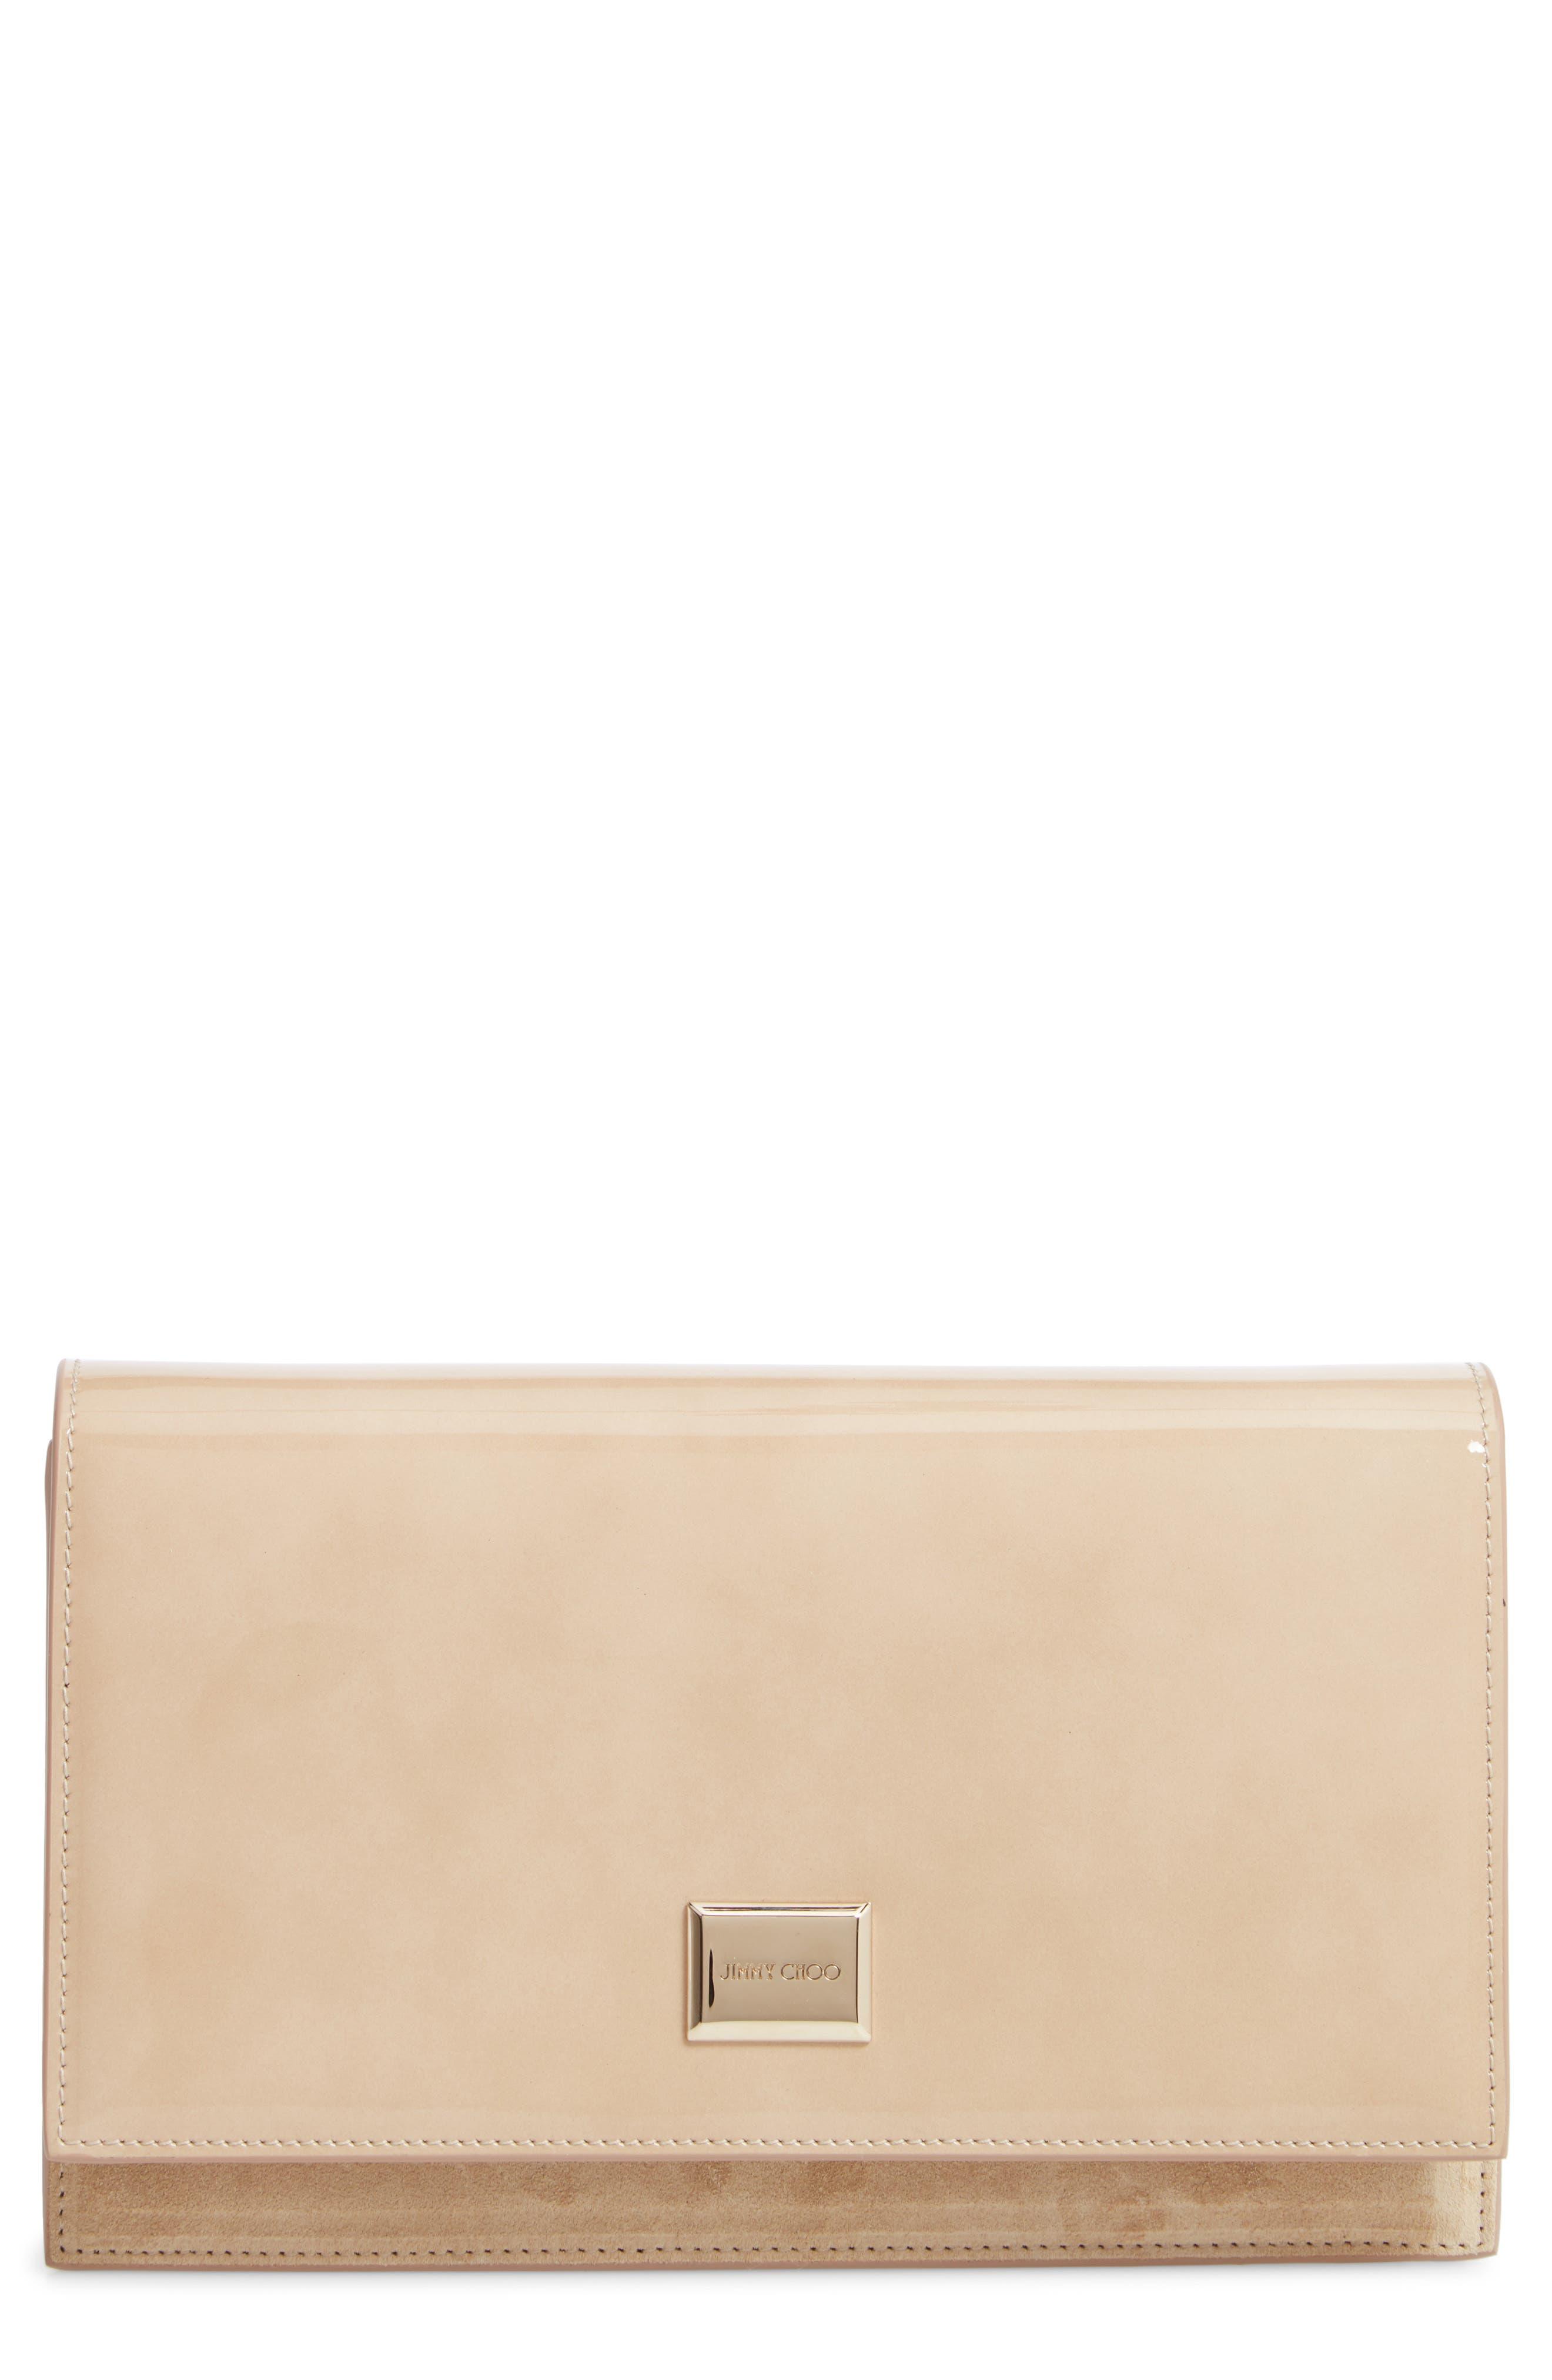 Lizzie Patent Leather & Suede Clutch, Main, color, NUDE